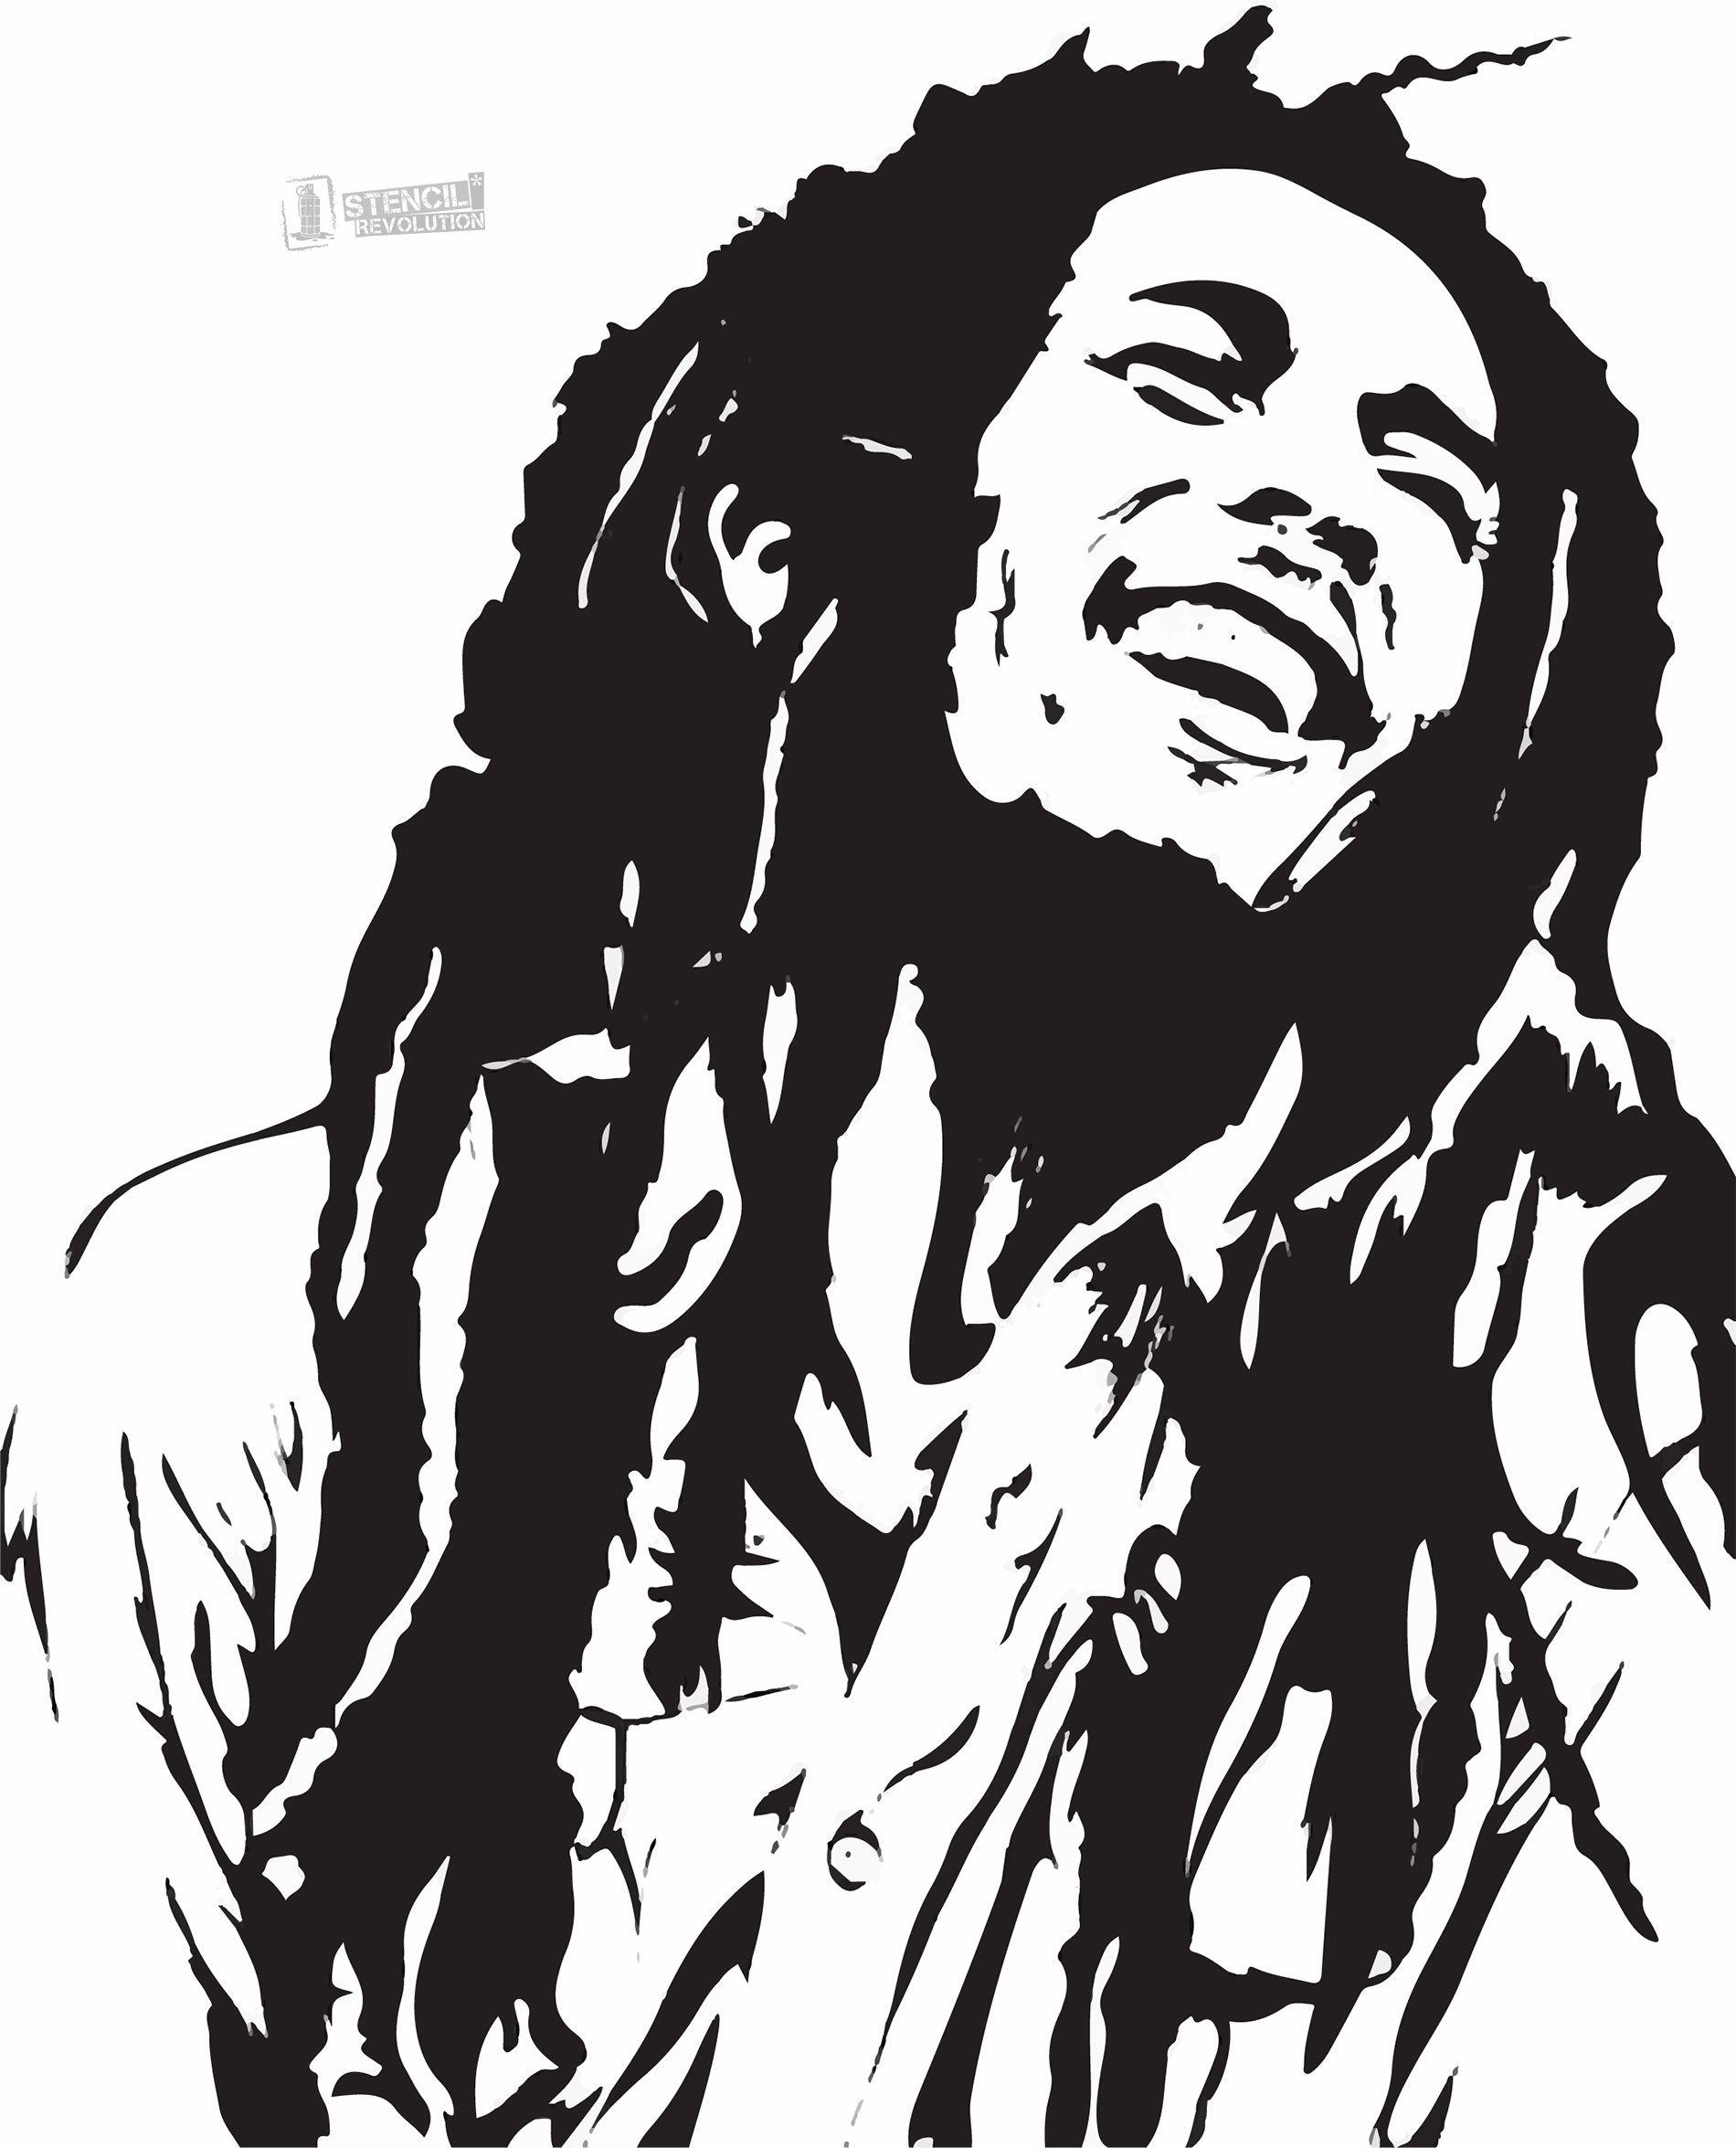 bob marley cartoon drawing at getdrawings com free for personal rh getdrawings com Bob Marley Silhouette Stencil Bob Marley Silhouette